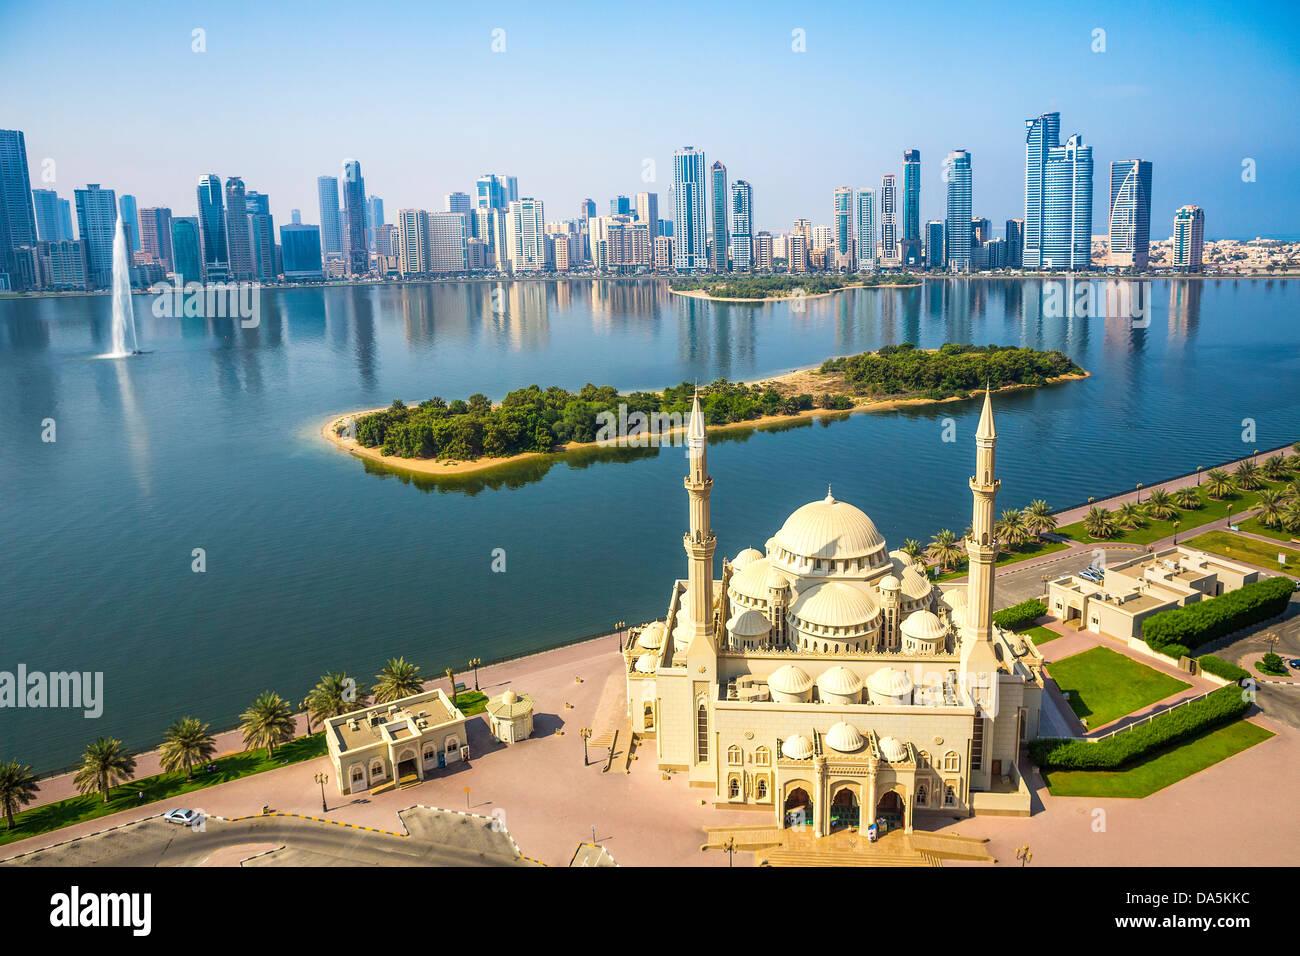 Expo Centre Sharjah UAE - YouTube